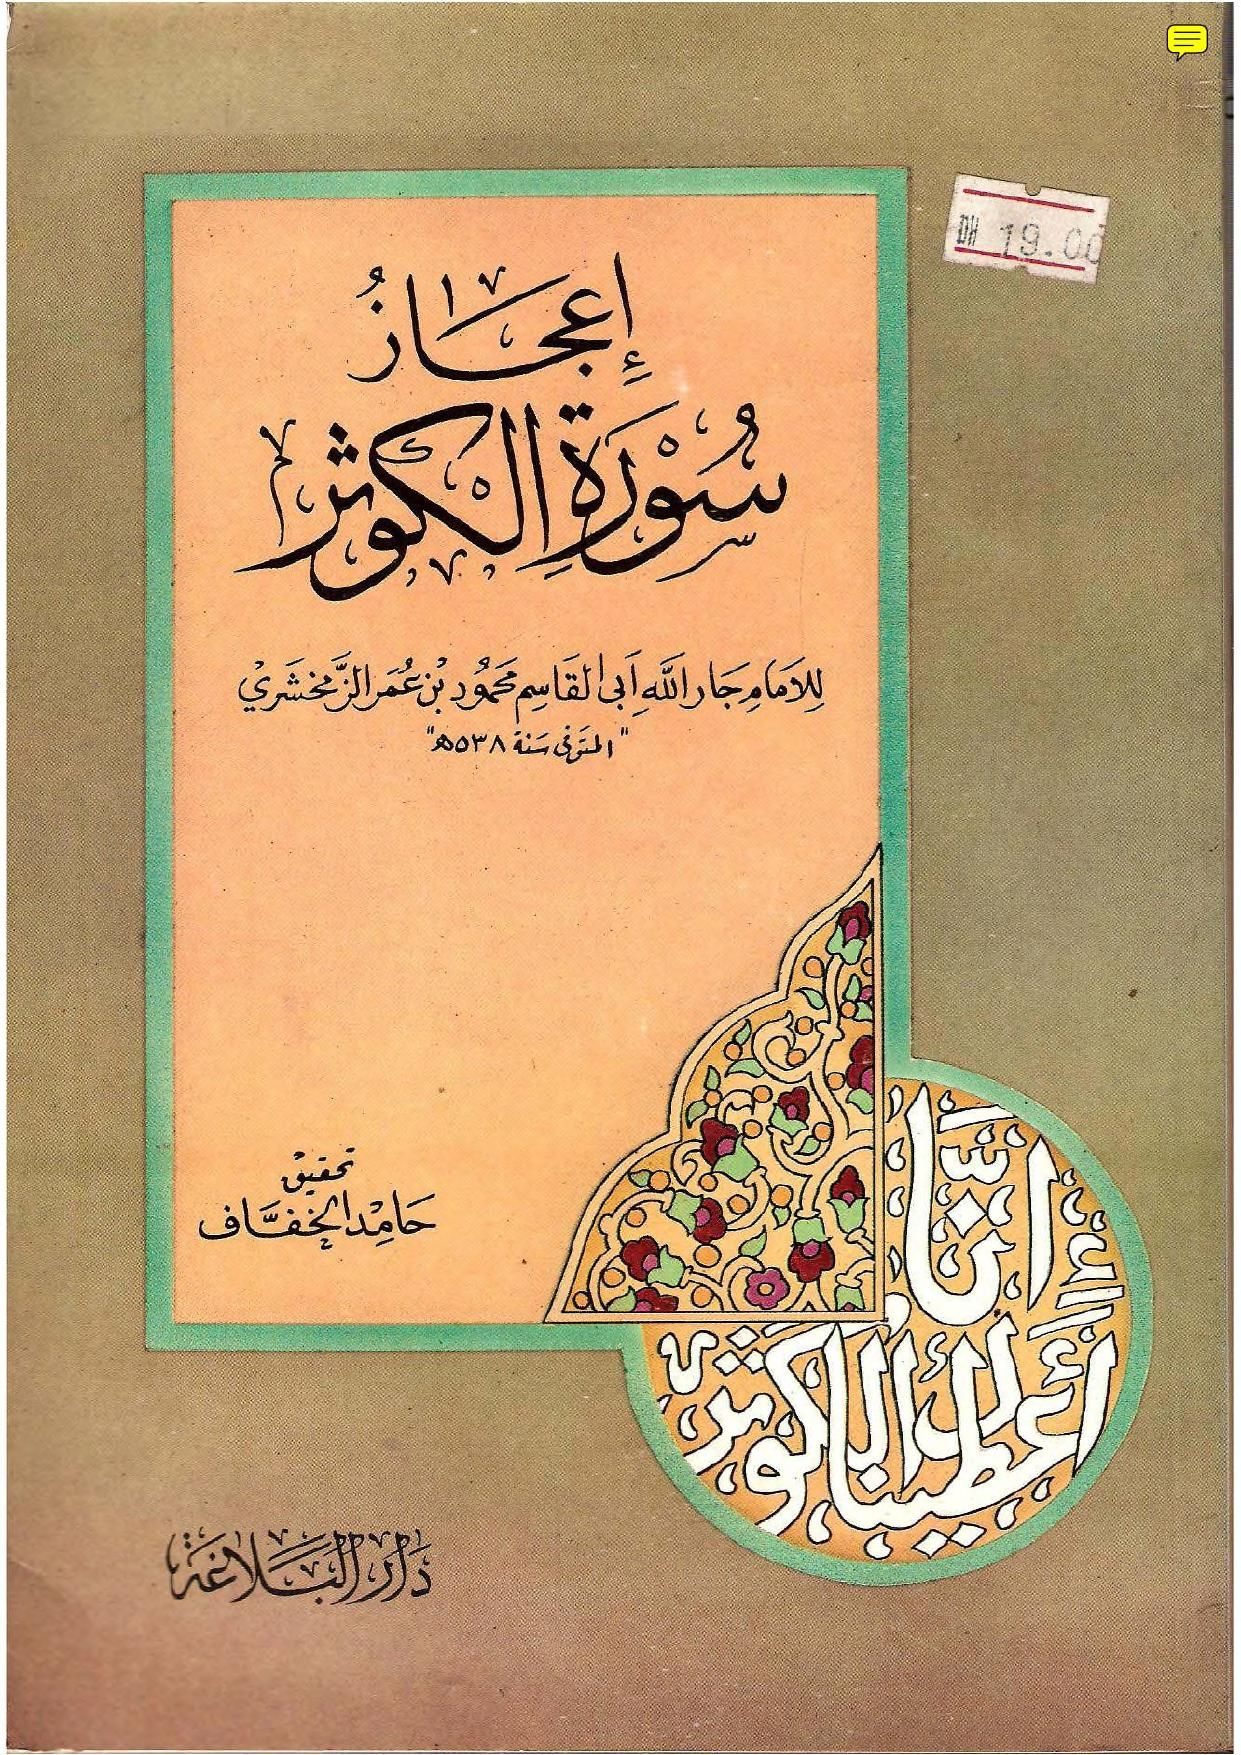 000019 إعجاز سورة الكوثر كتاب بي دي اف اقرا اونلاين Free Download Borrow And Streaming Internet Archive Free Ebooks Download Books Arabic Books My Books